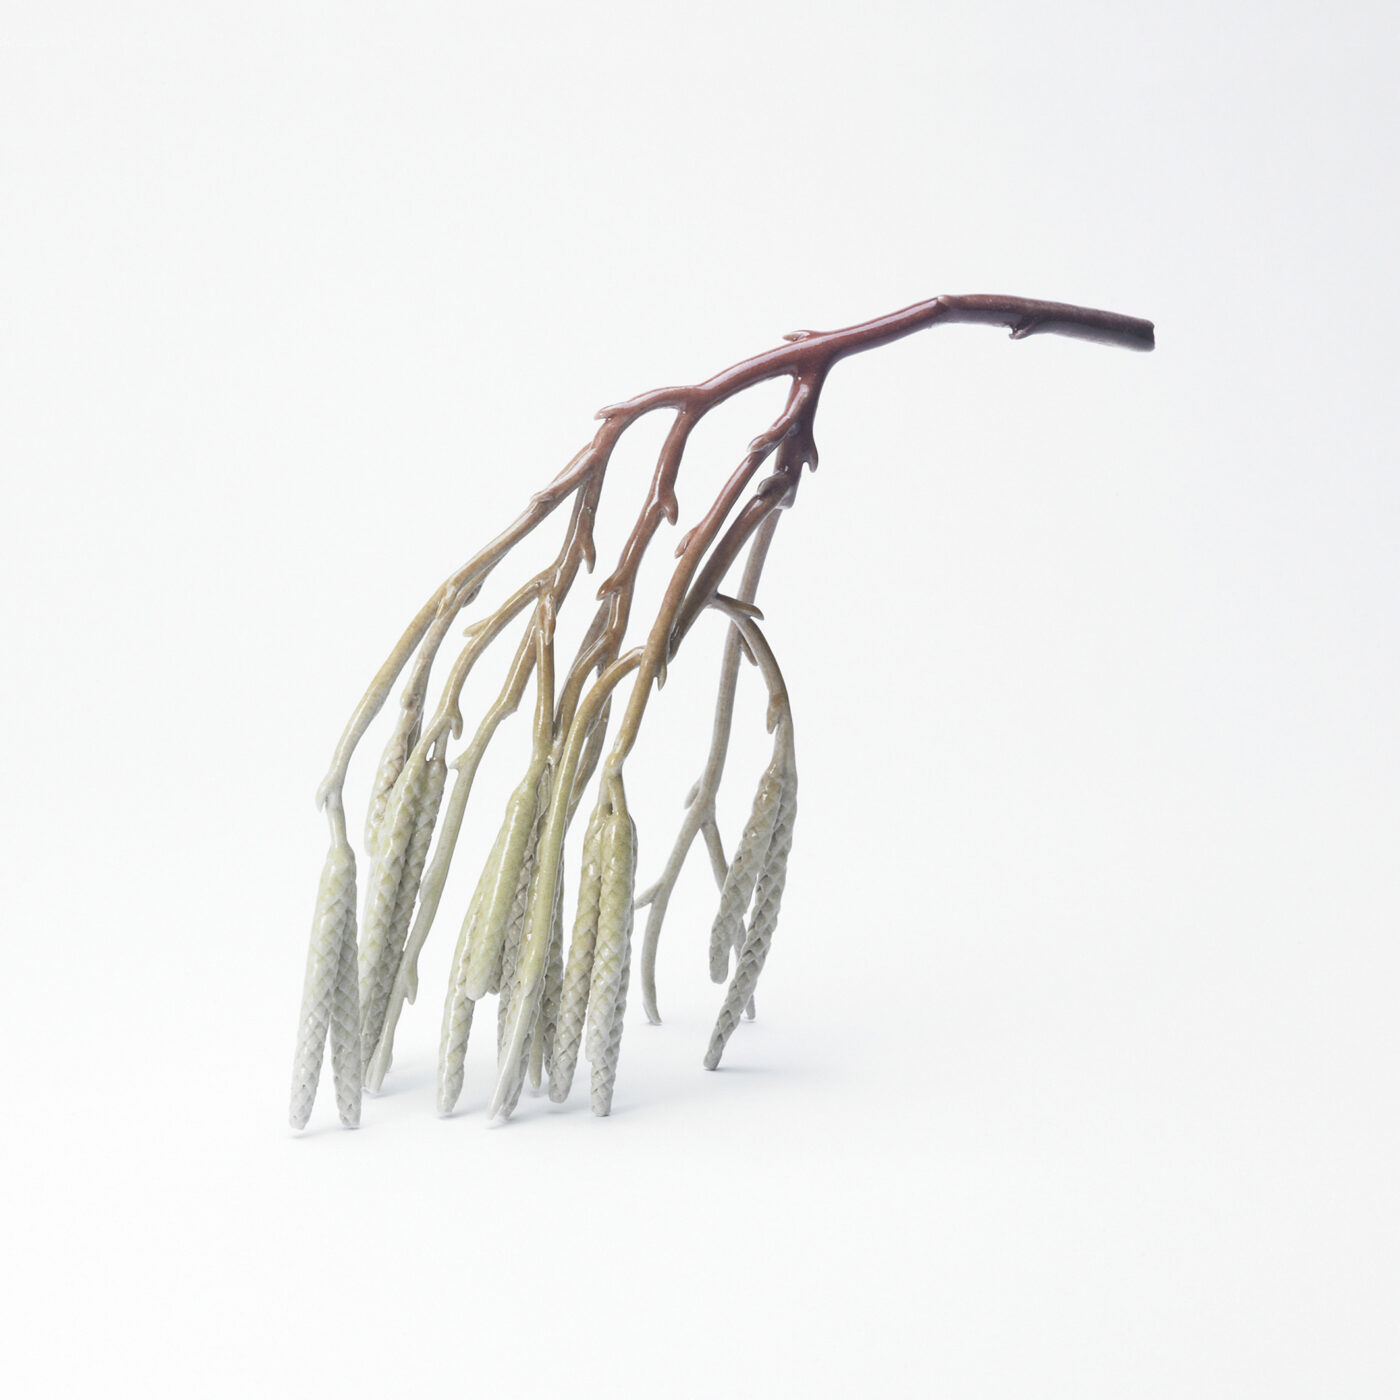 Keramiker Marianne Nielsen - Birk, 2019, foto: Mads Hagedorn-Olsen